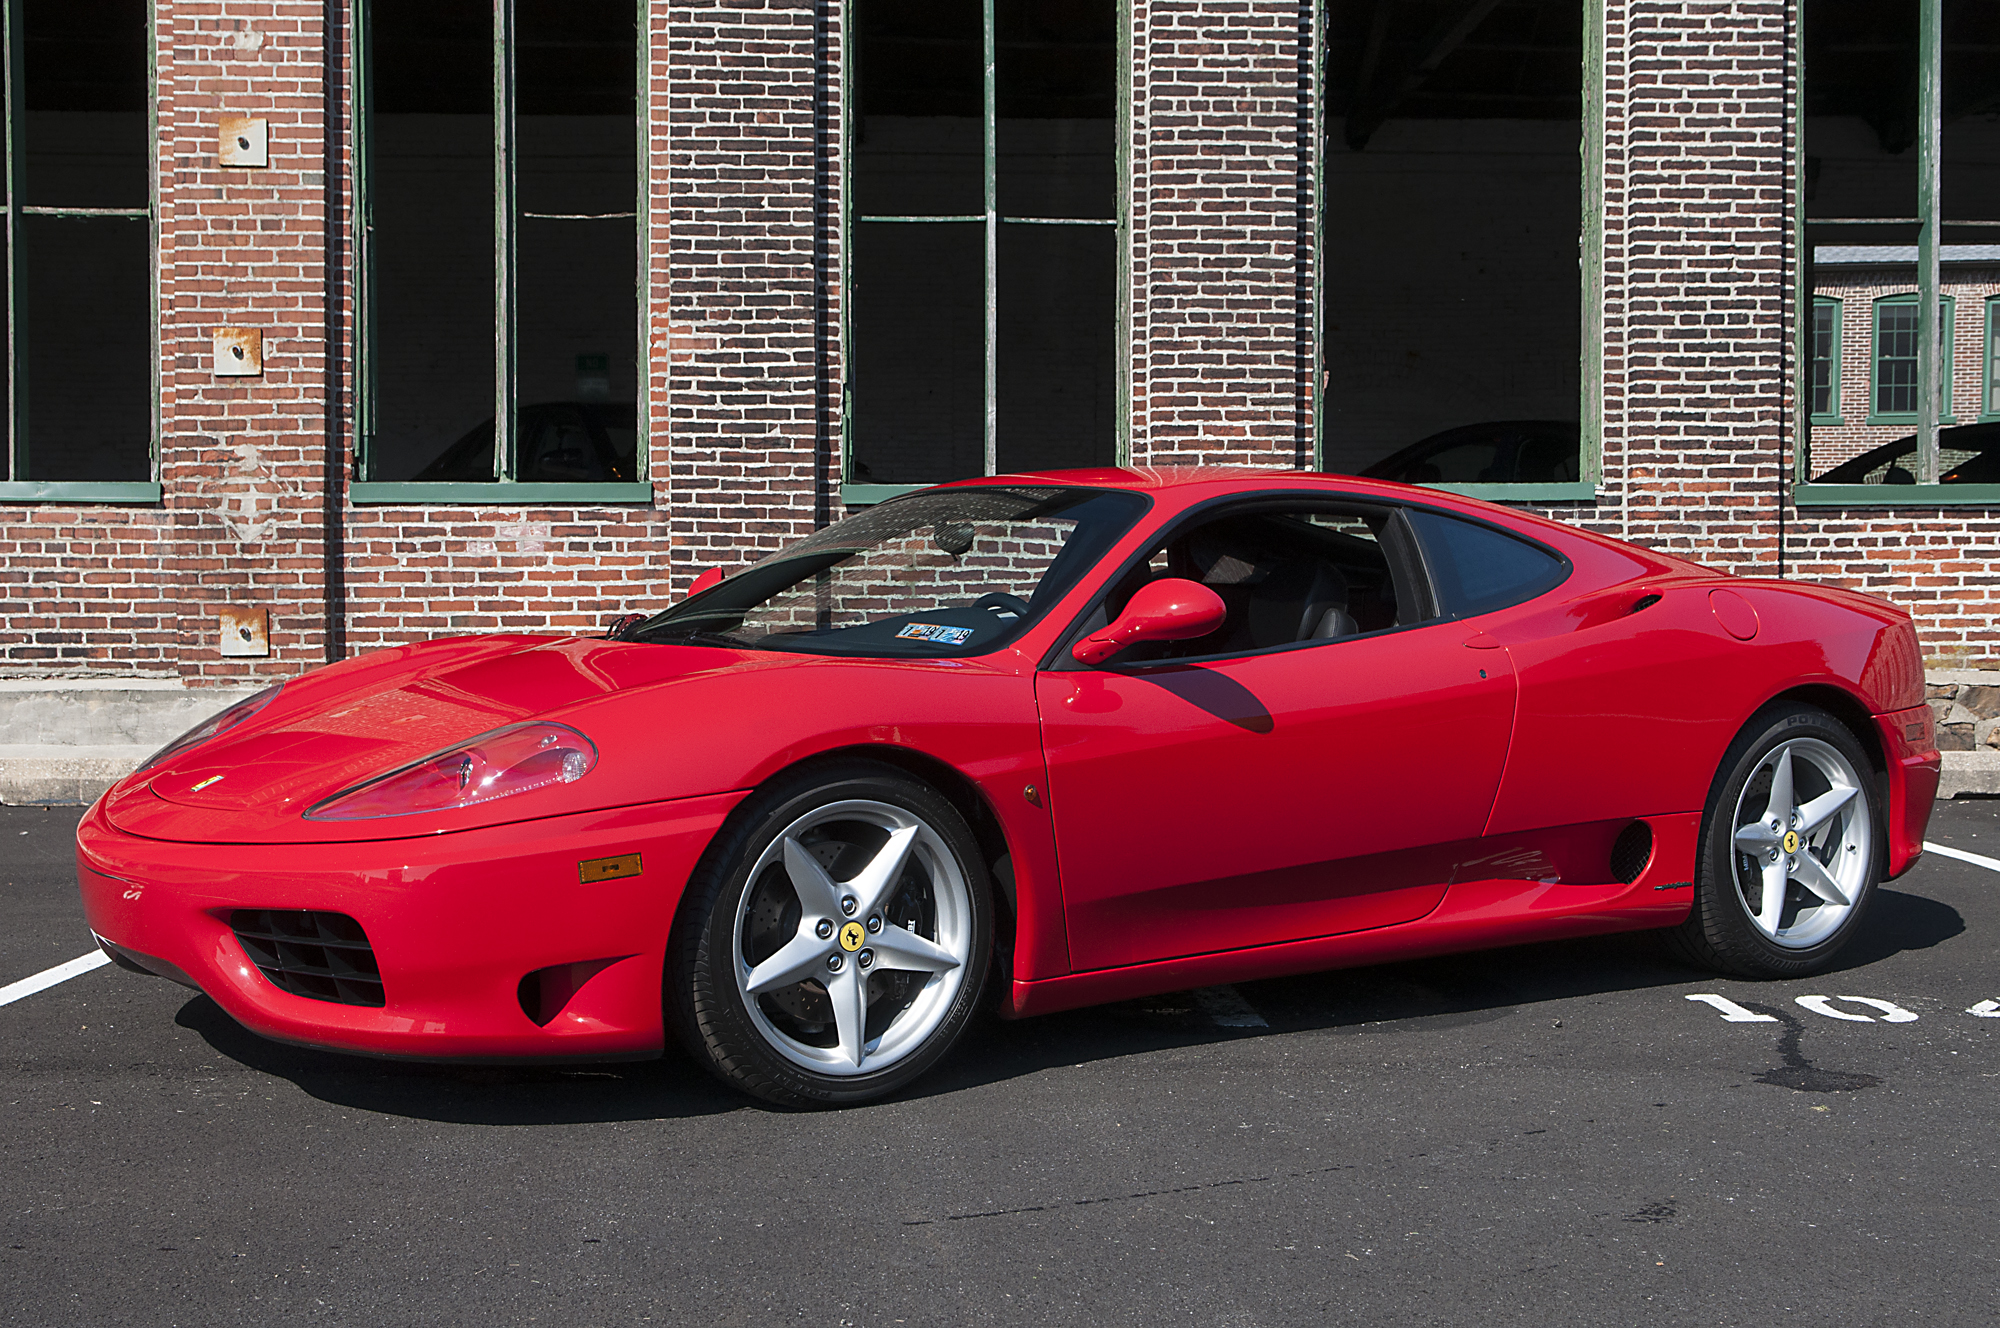 For Sale Pick One 2000 Ferrari 360 6 Mt 2006 Ferrari F430 F1 Coupe Ferrarichat